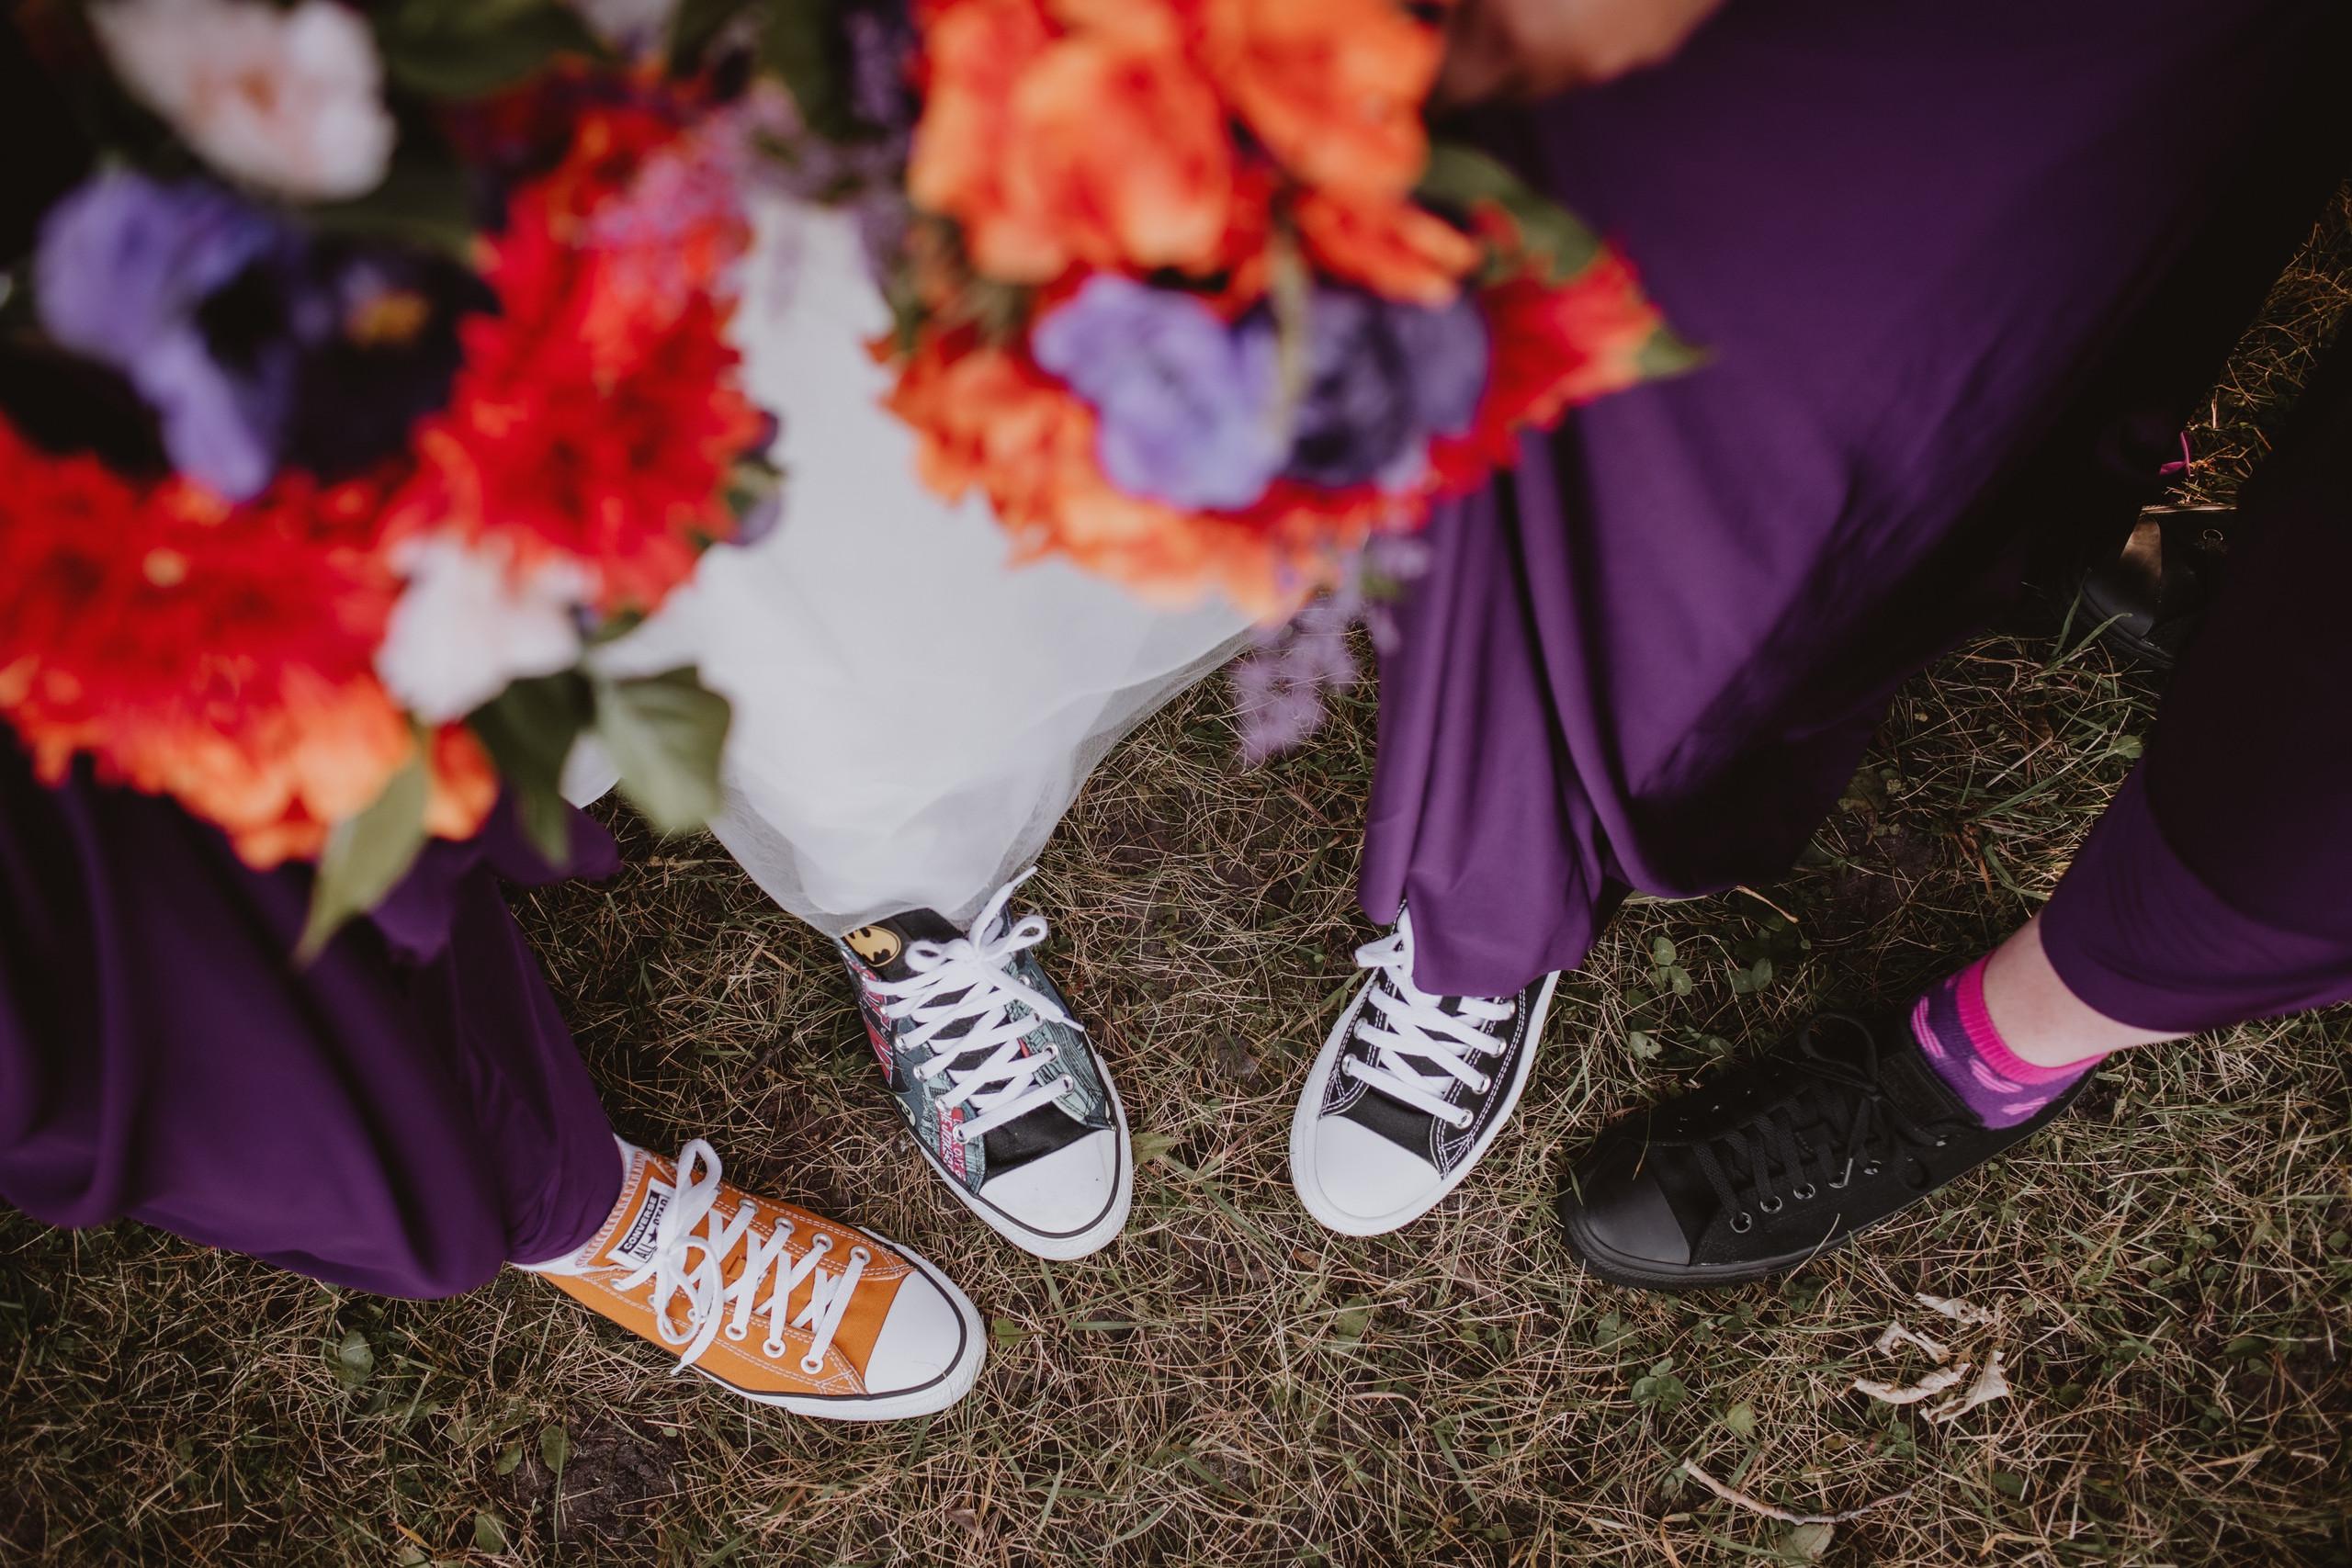 Bridesmaid Wear Converse for fall wedding day.